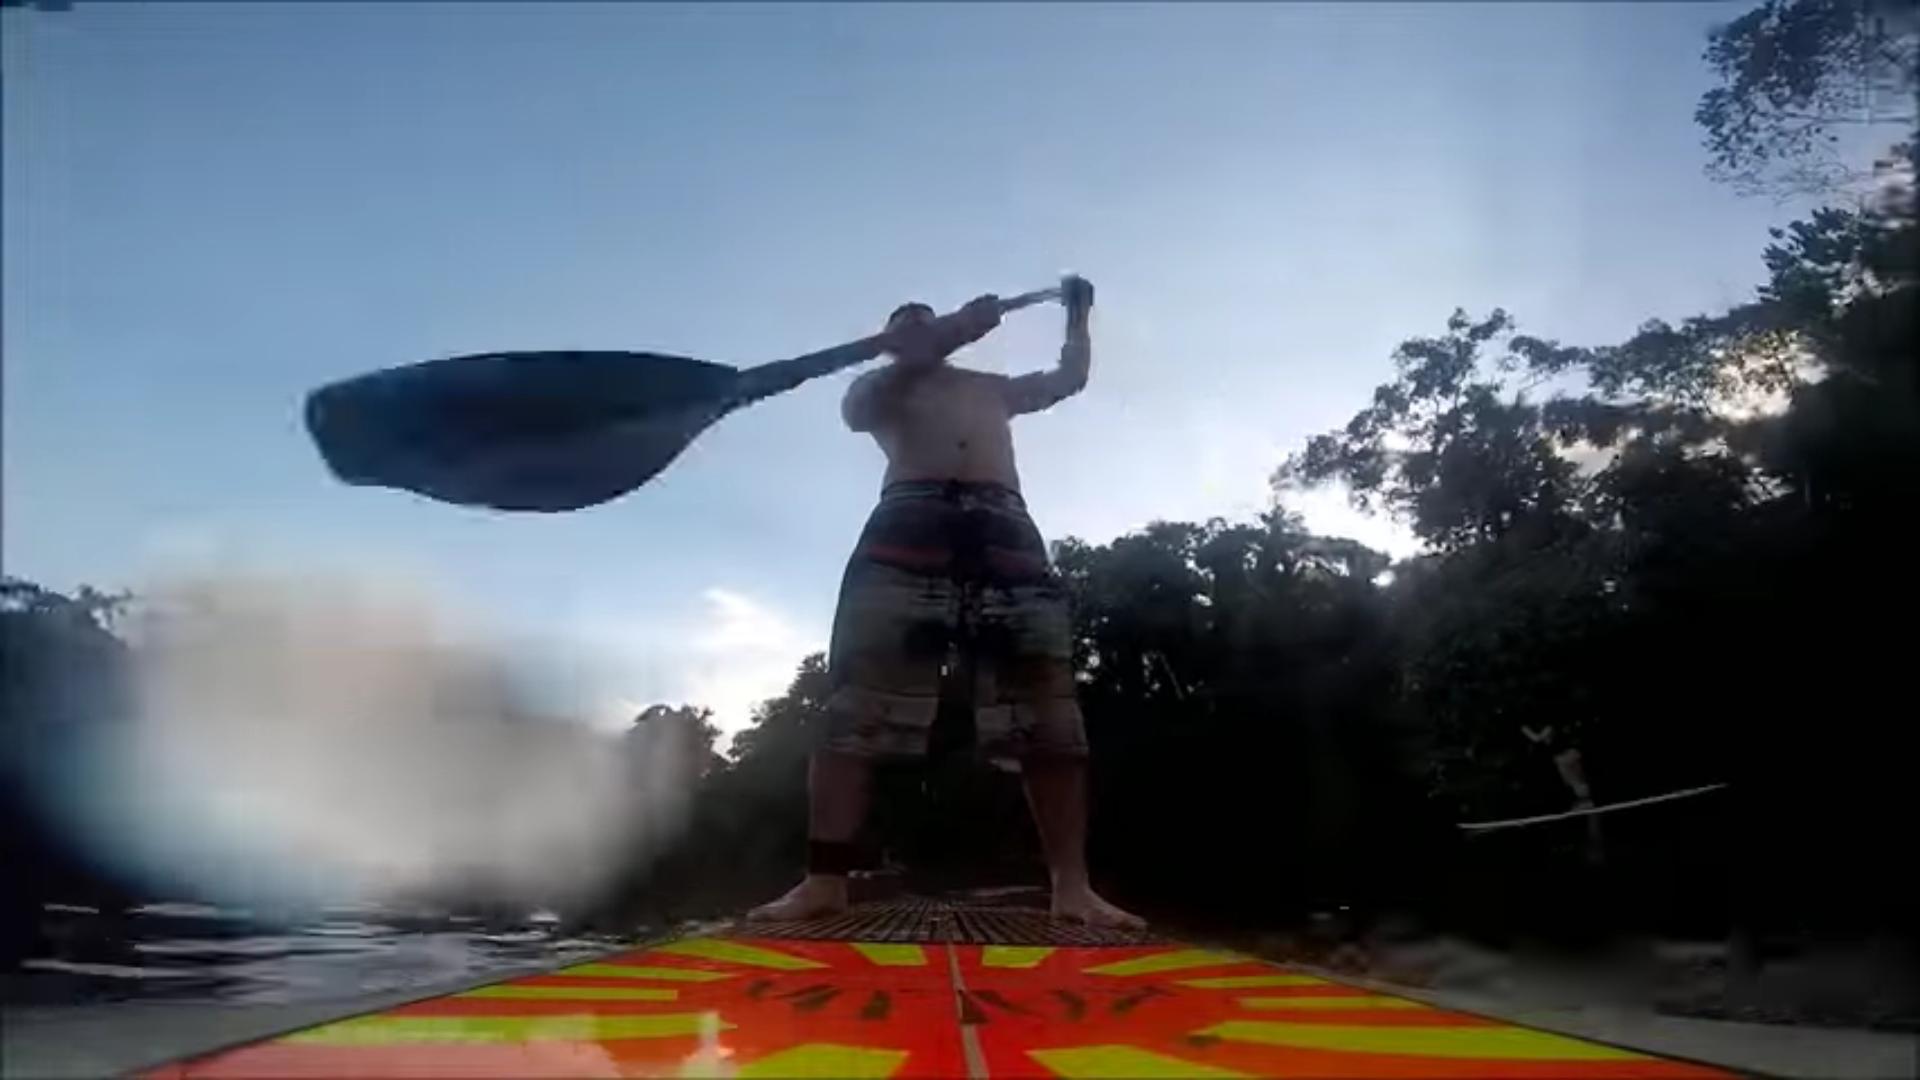 prancha-stand-up-paddle-sup